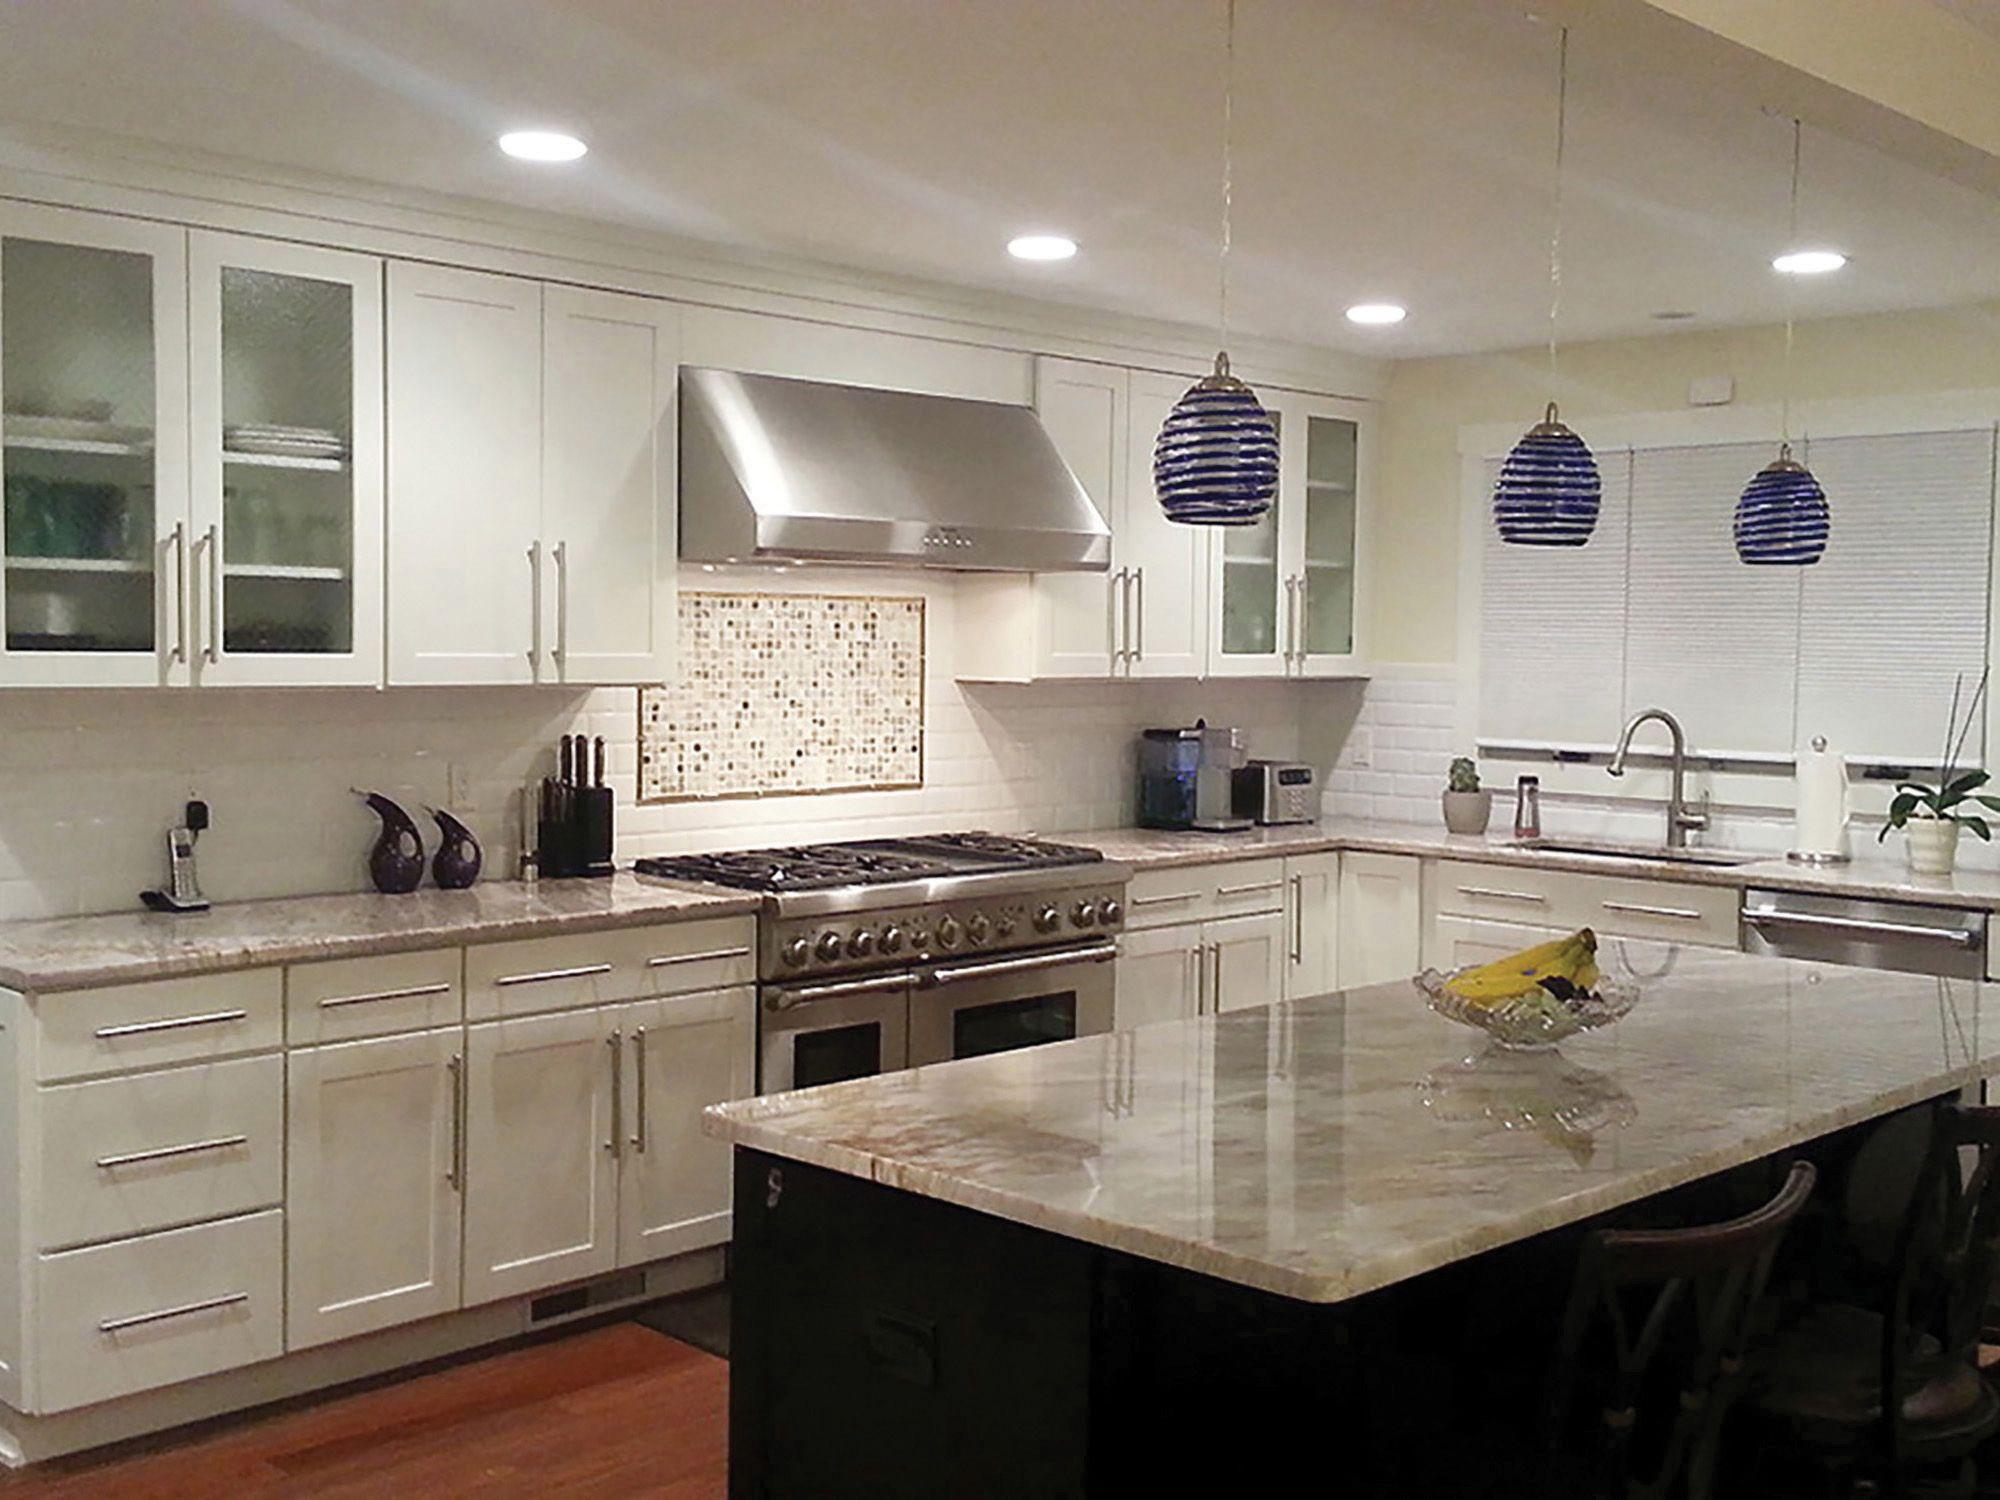 Küchendesign-logo trumbull connecticut kitchen renovation features cliqstudios